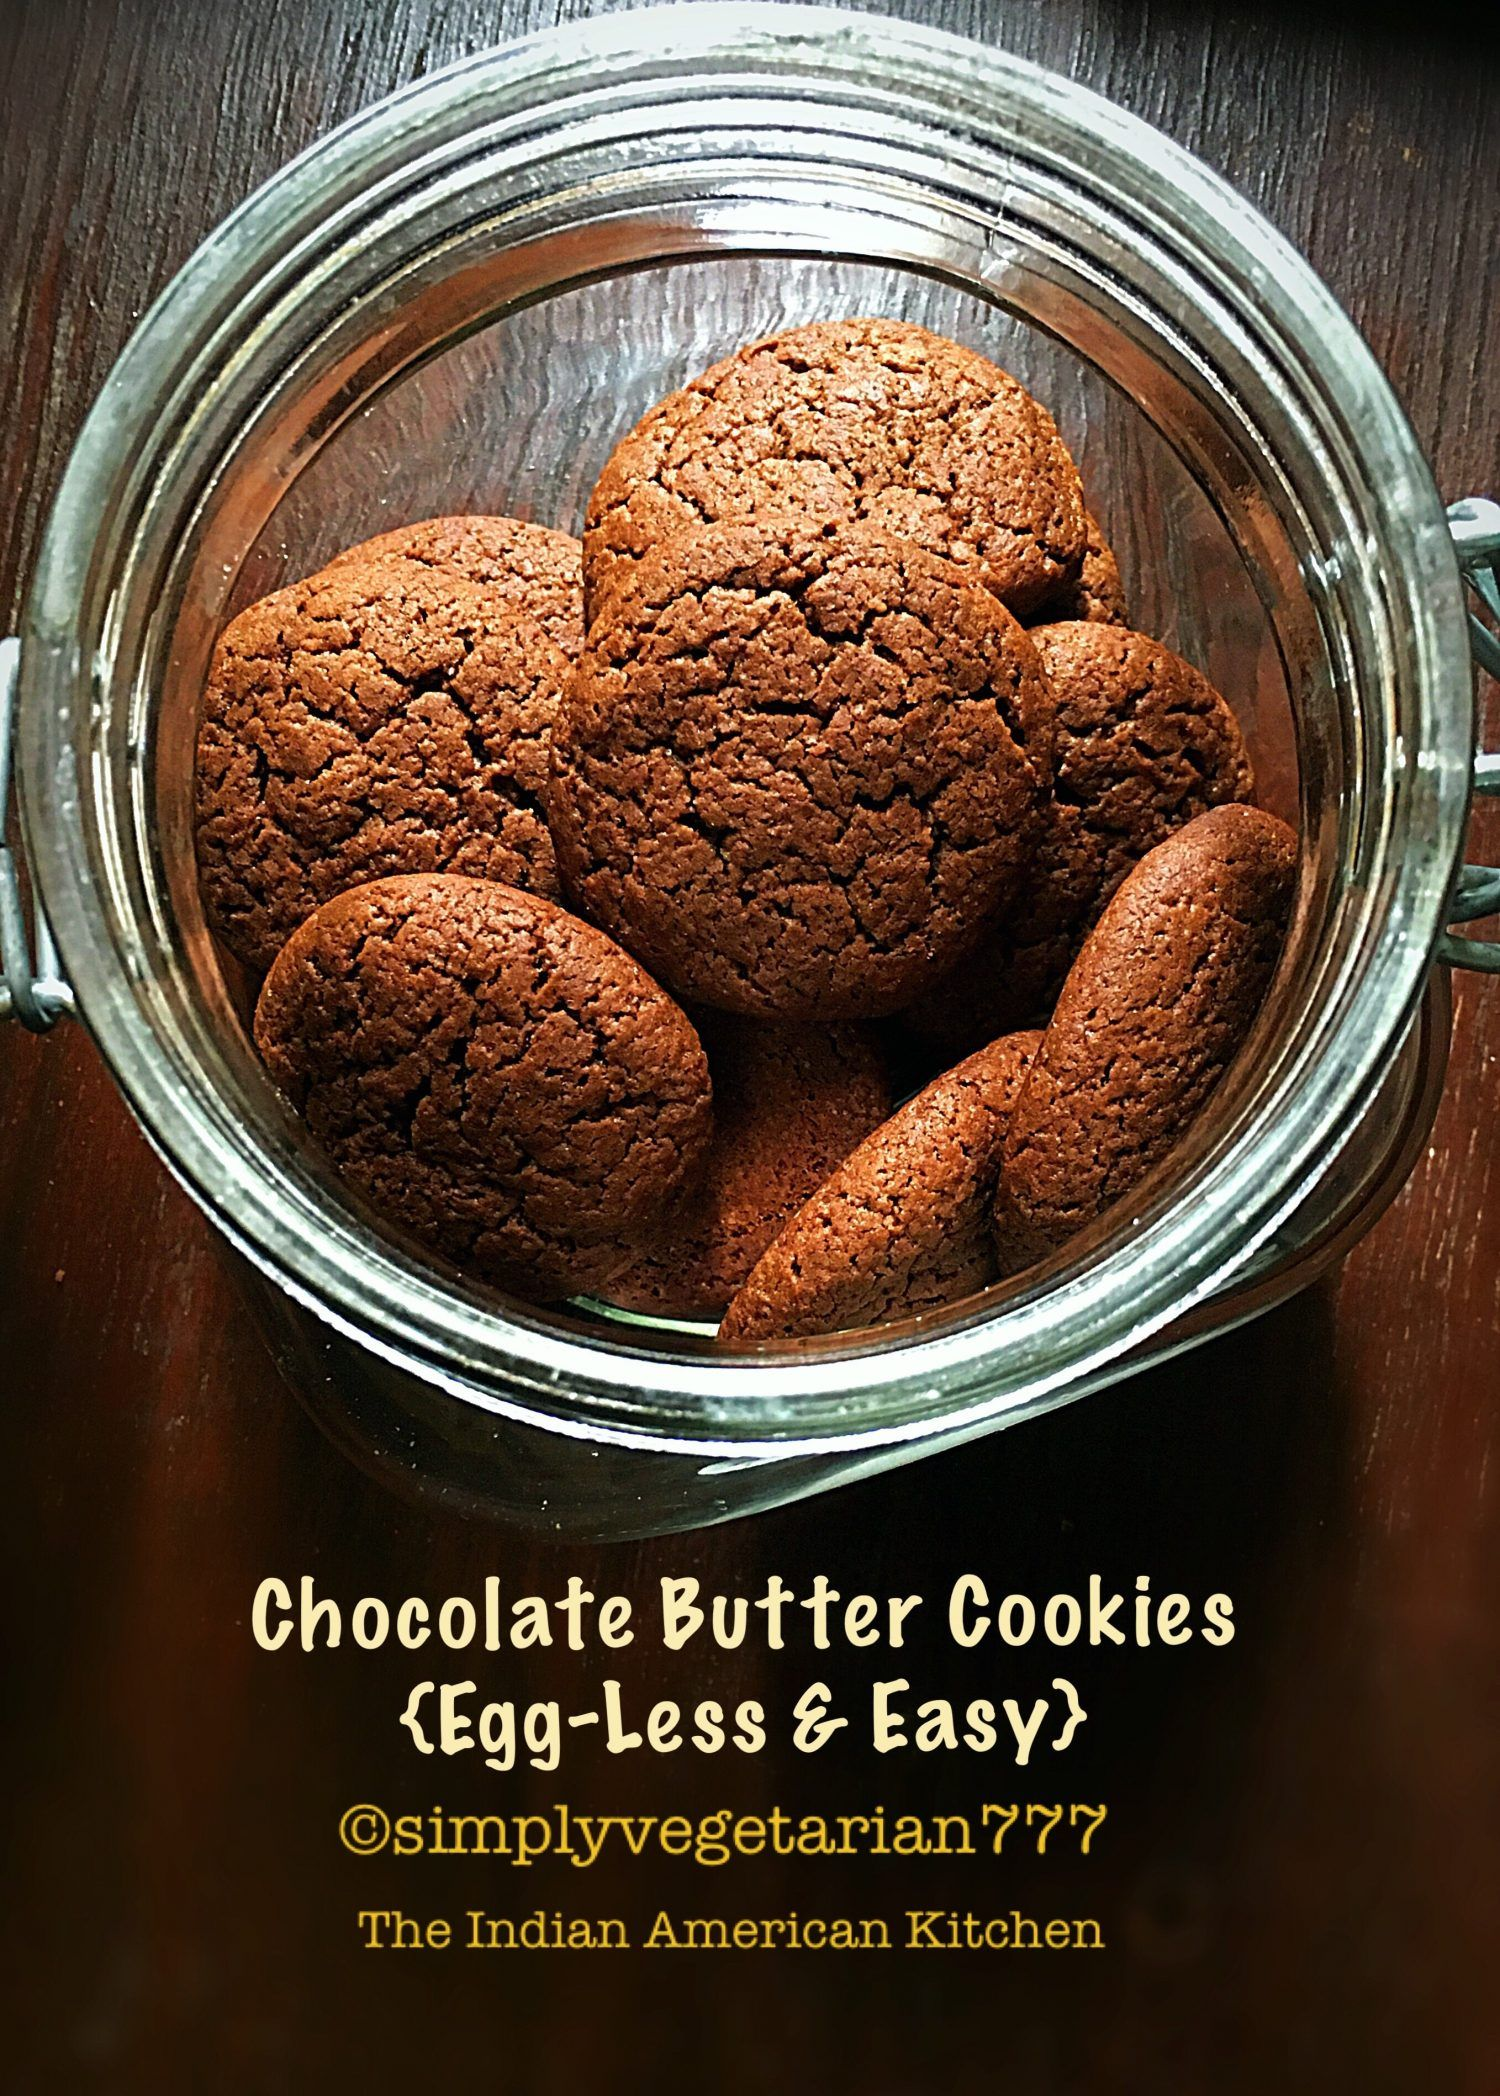 Chocolate Cookies - Eggless & Easy, how to make cookies ...